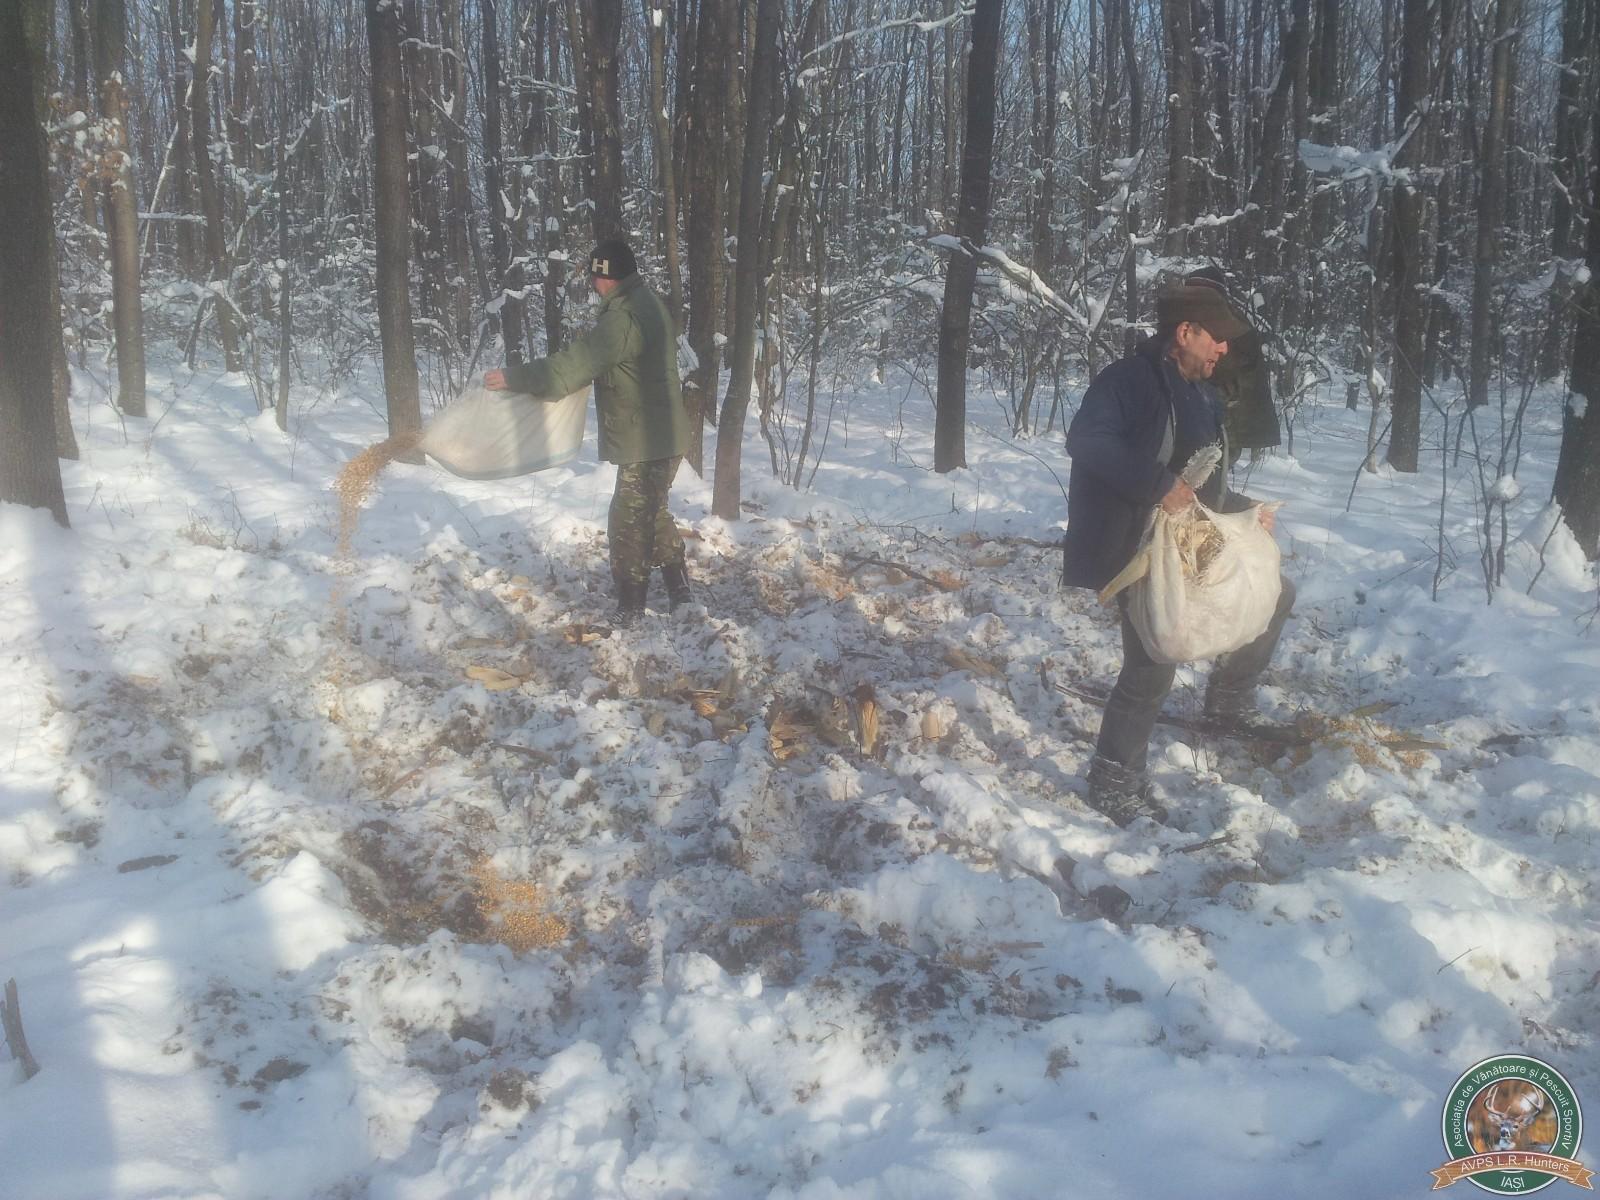 avps-lr-hunters-garceni_4-13